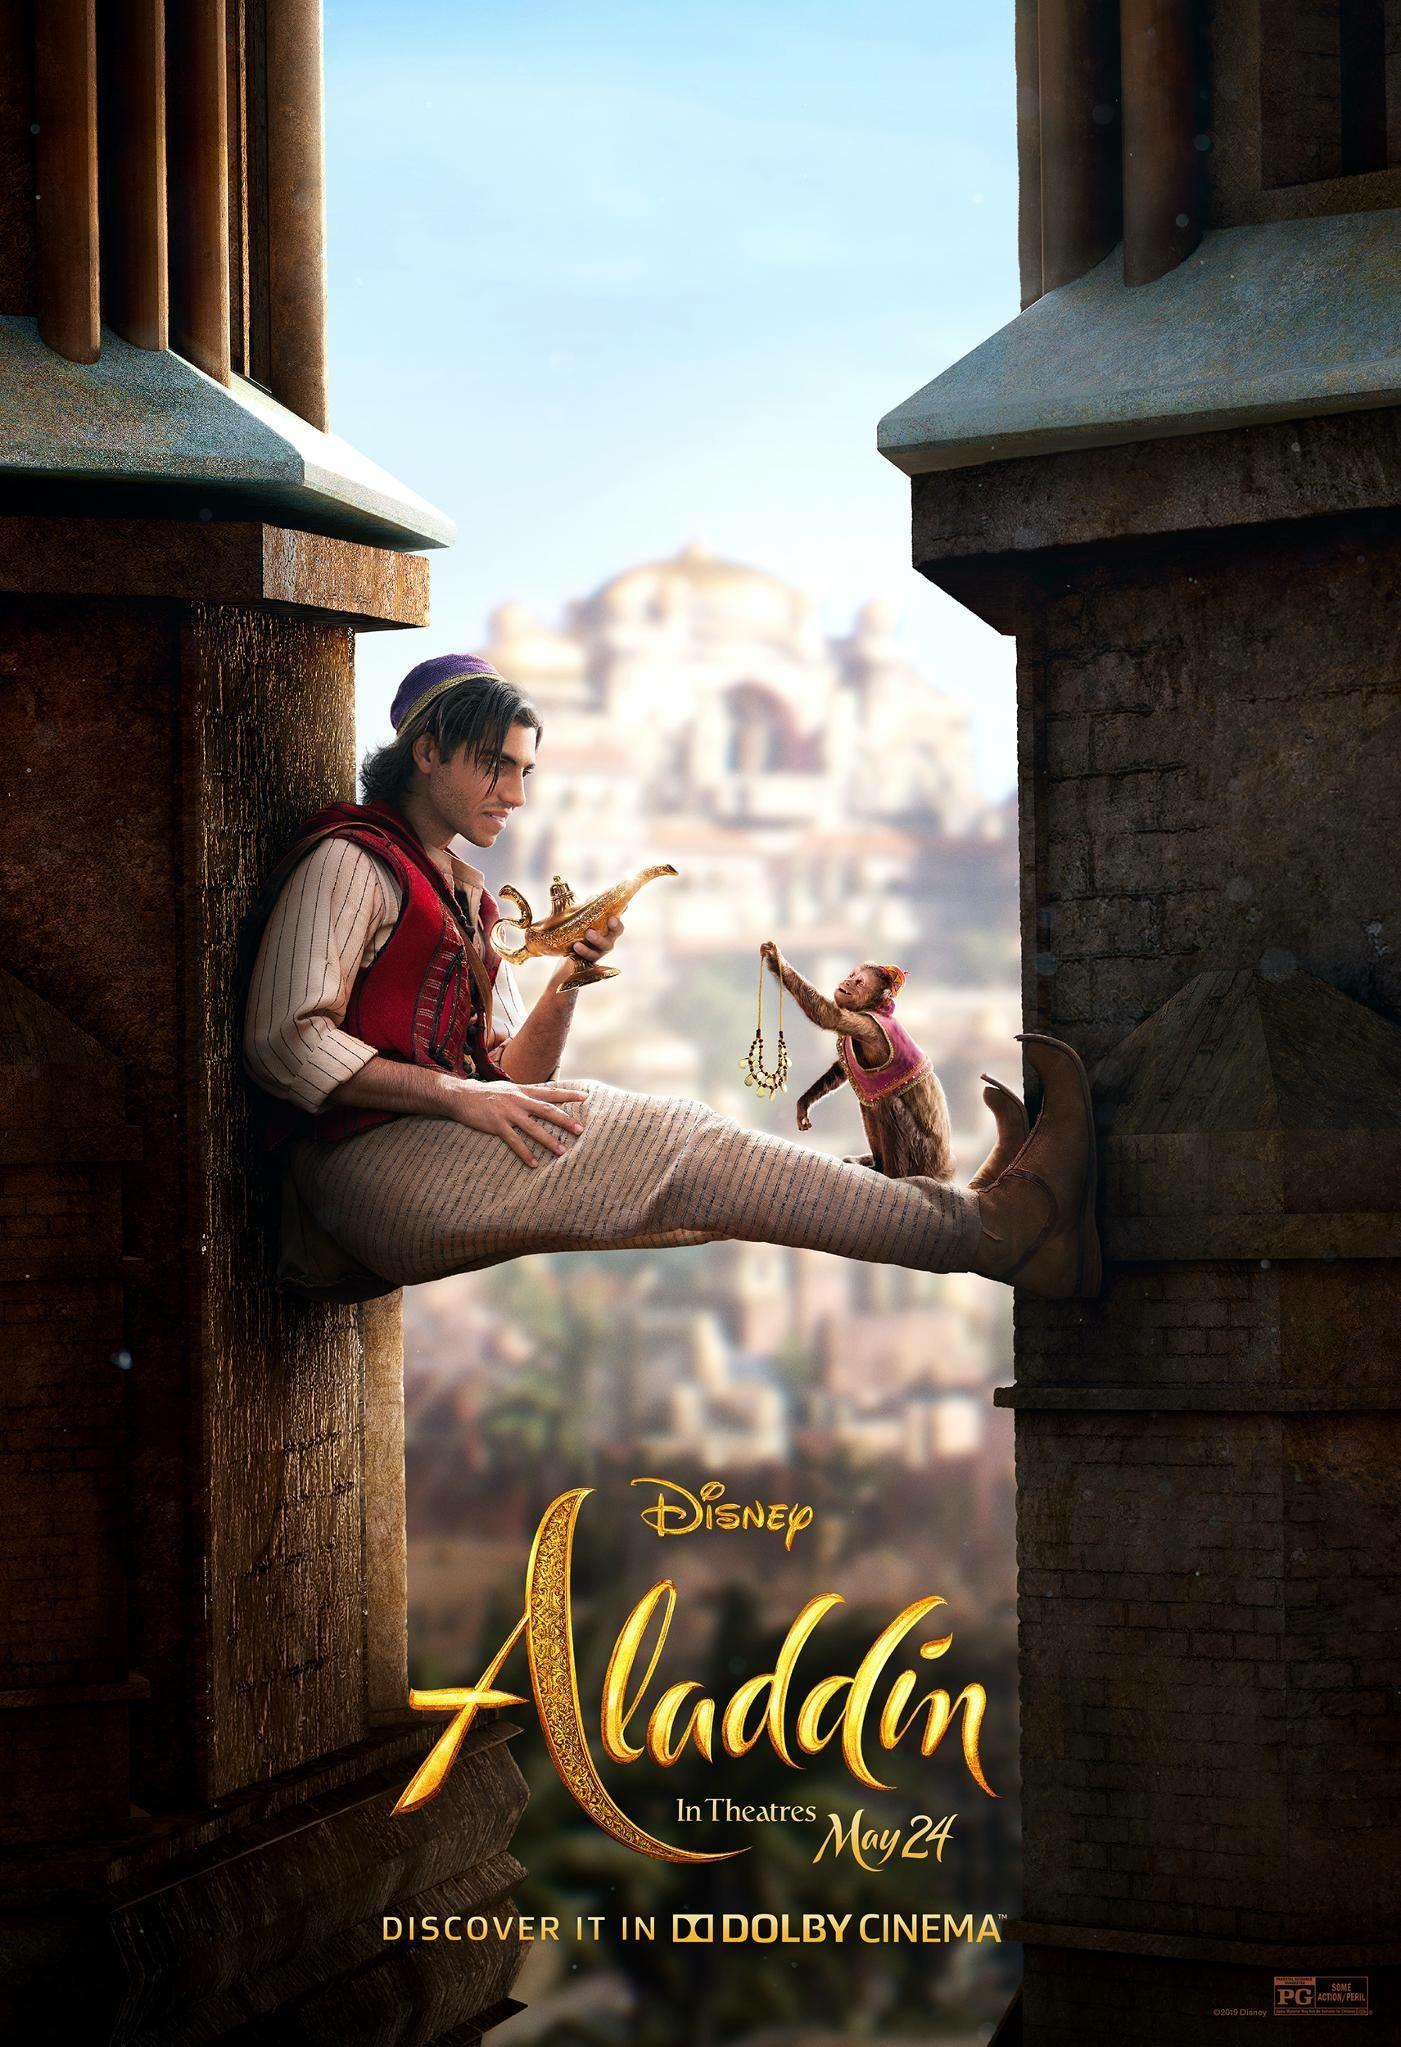 Affiche Poster aladdin disney film